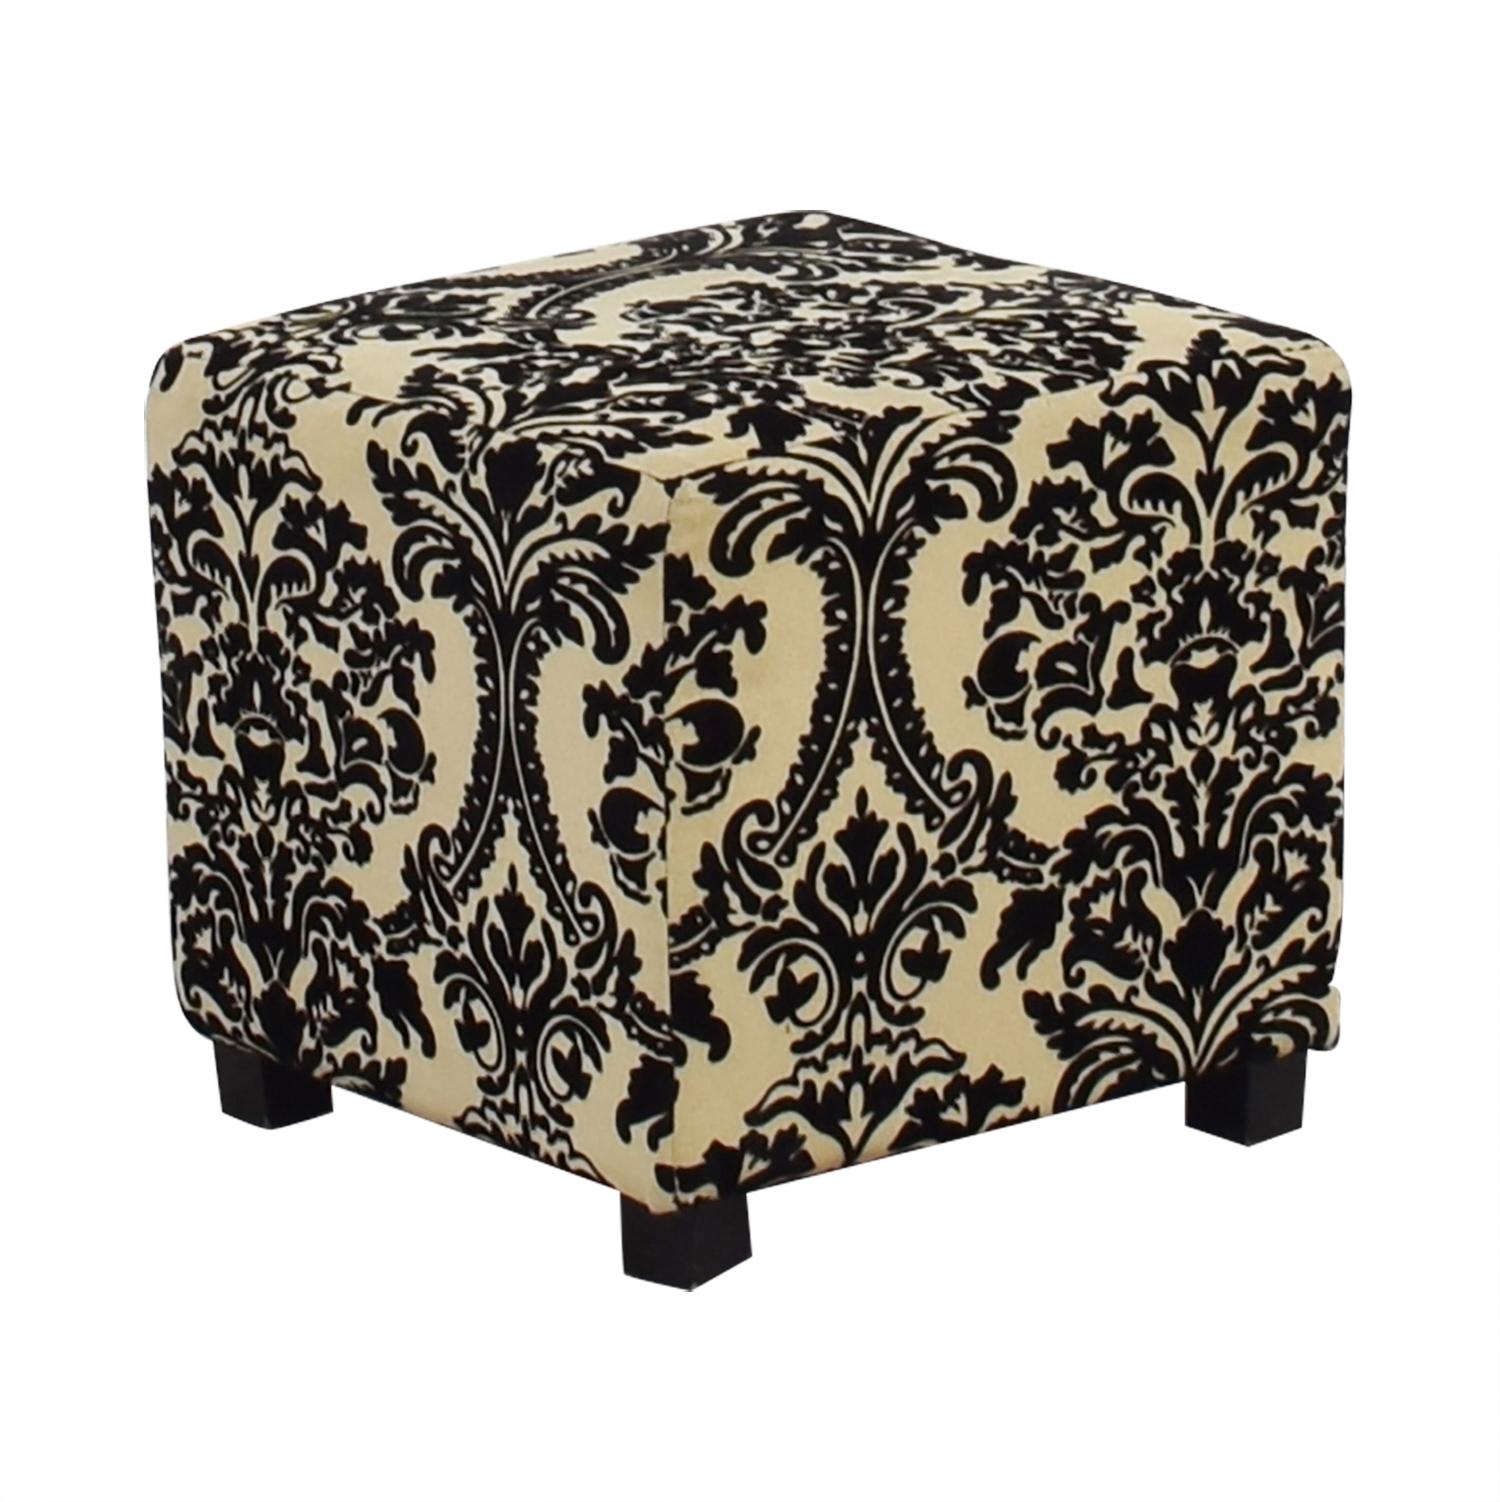 Marvelous 64 Off Bed Bath Beyond Bed Bath Beyond Black White Ottoman Chairs Machost Co Dining Chair Design Ideas Machostcouk